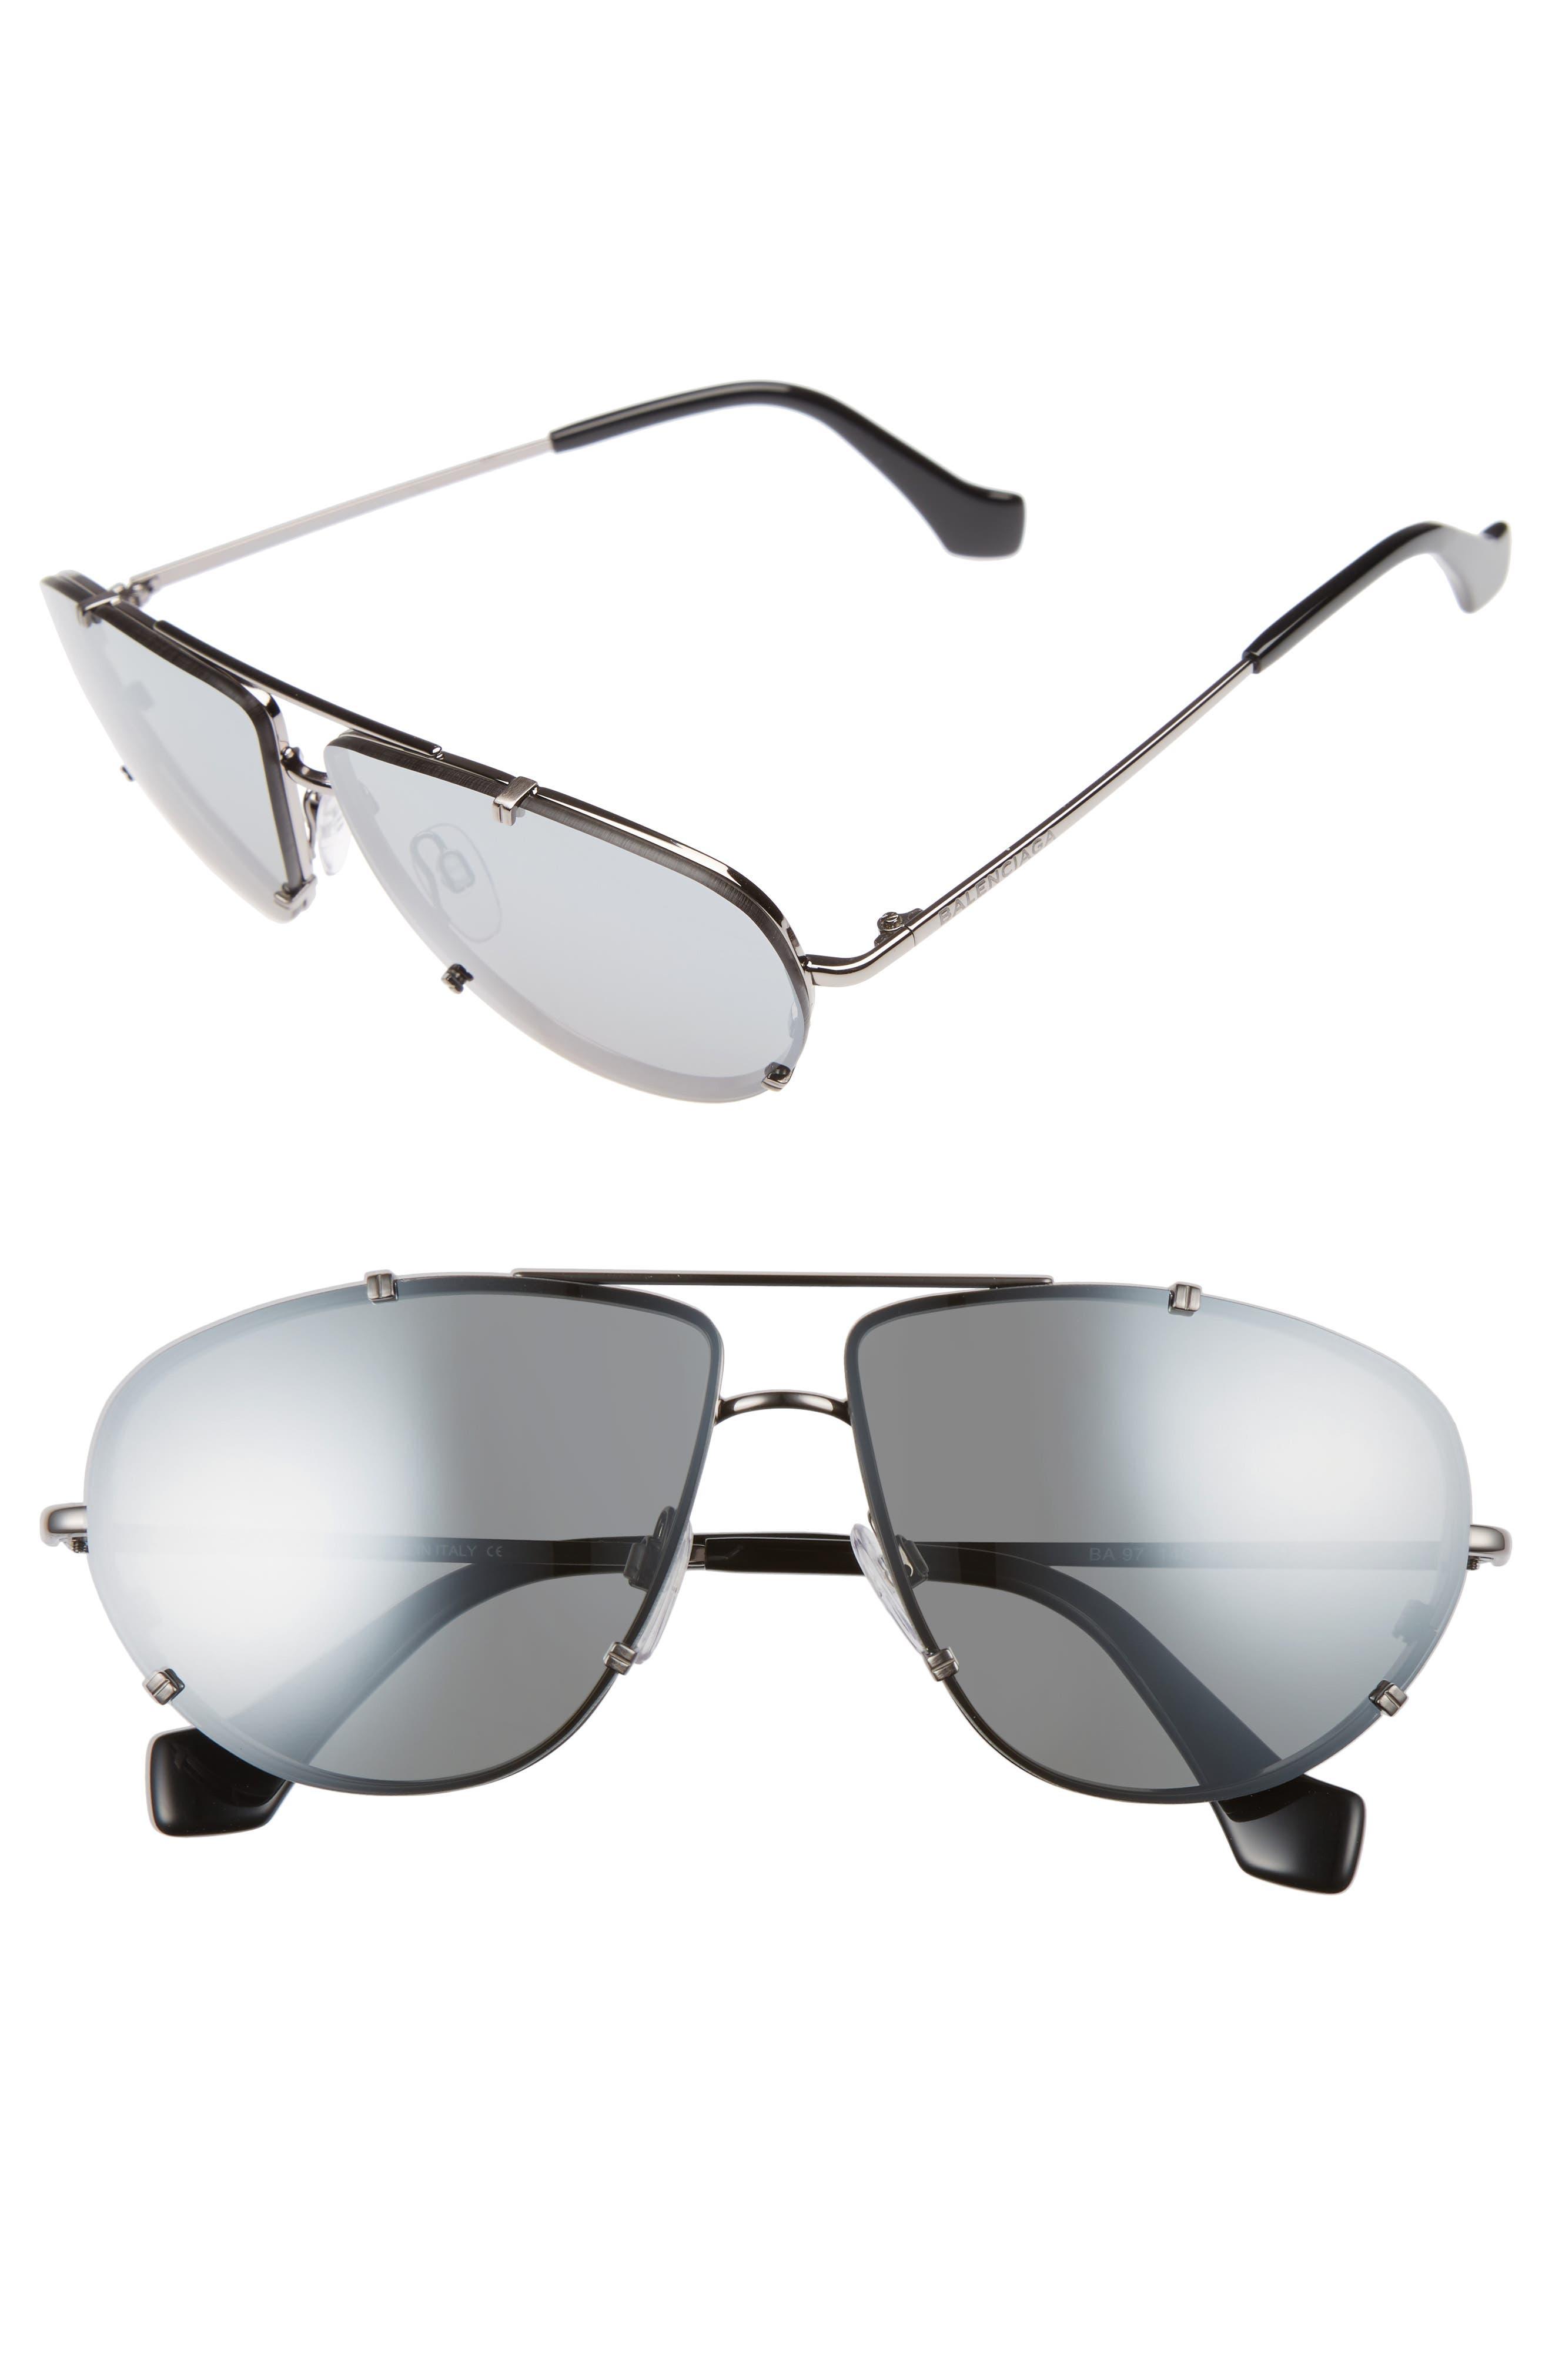 62mm Aviator Sunglasses,                             Main thumbnail 1, color,                             040